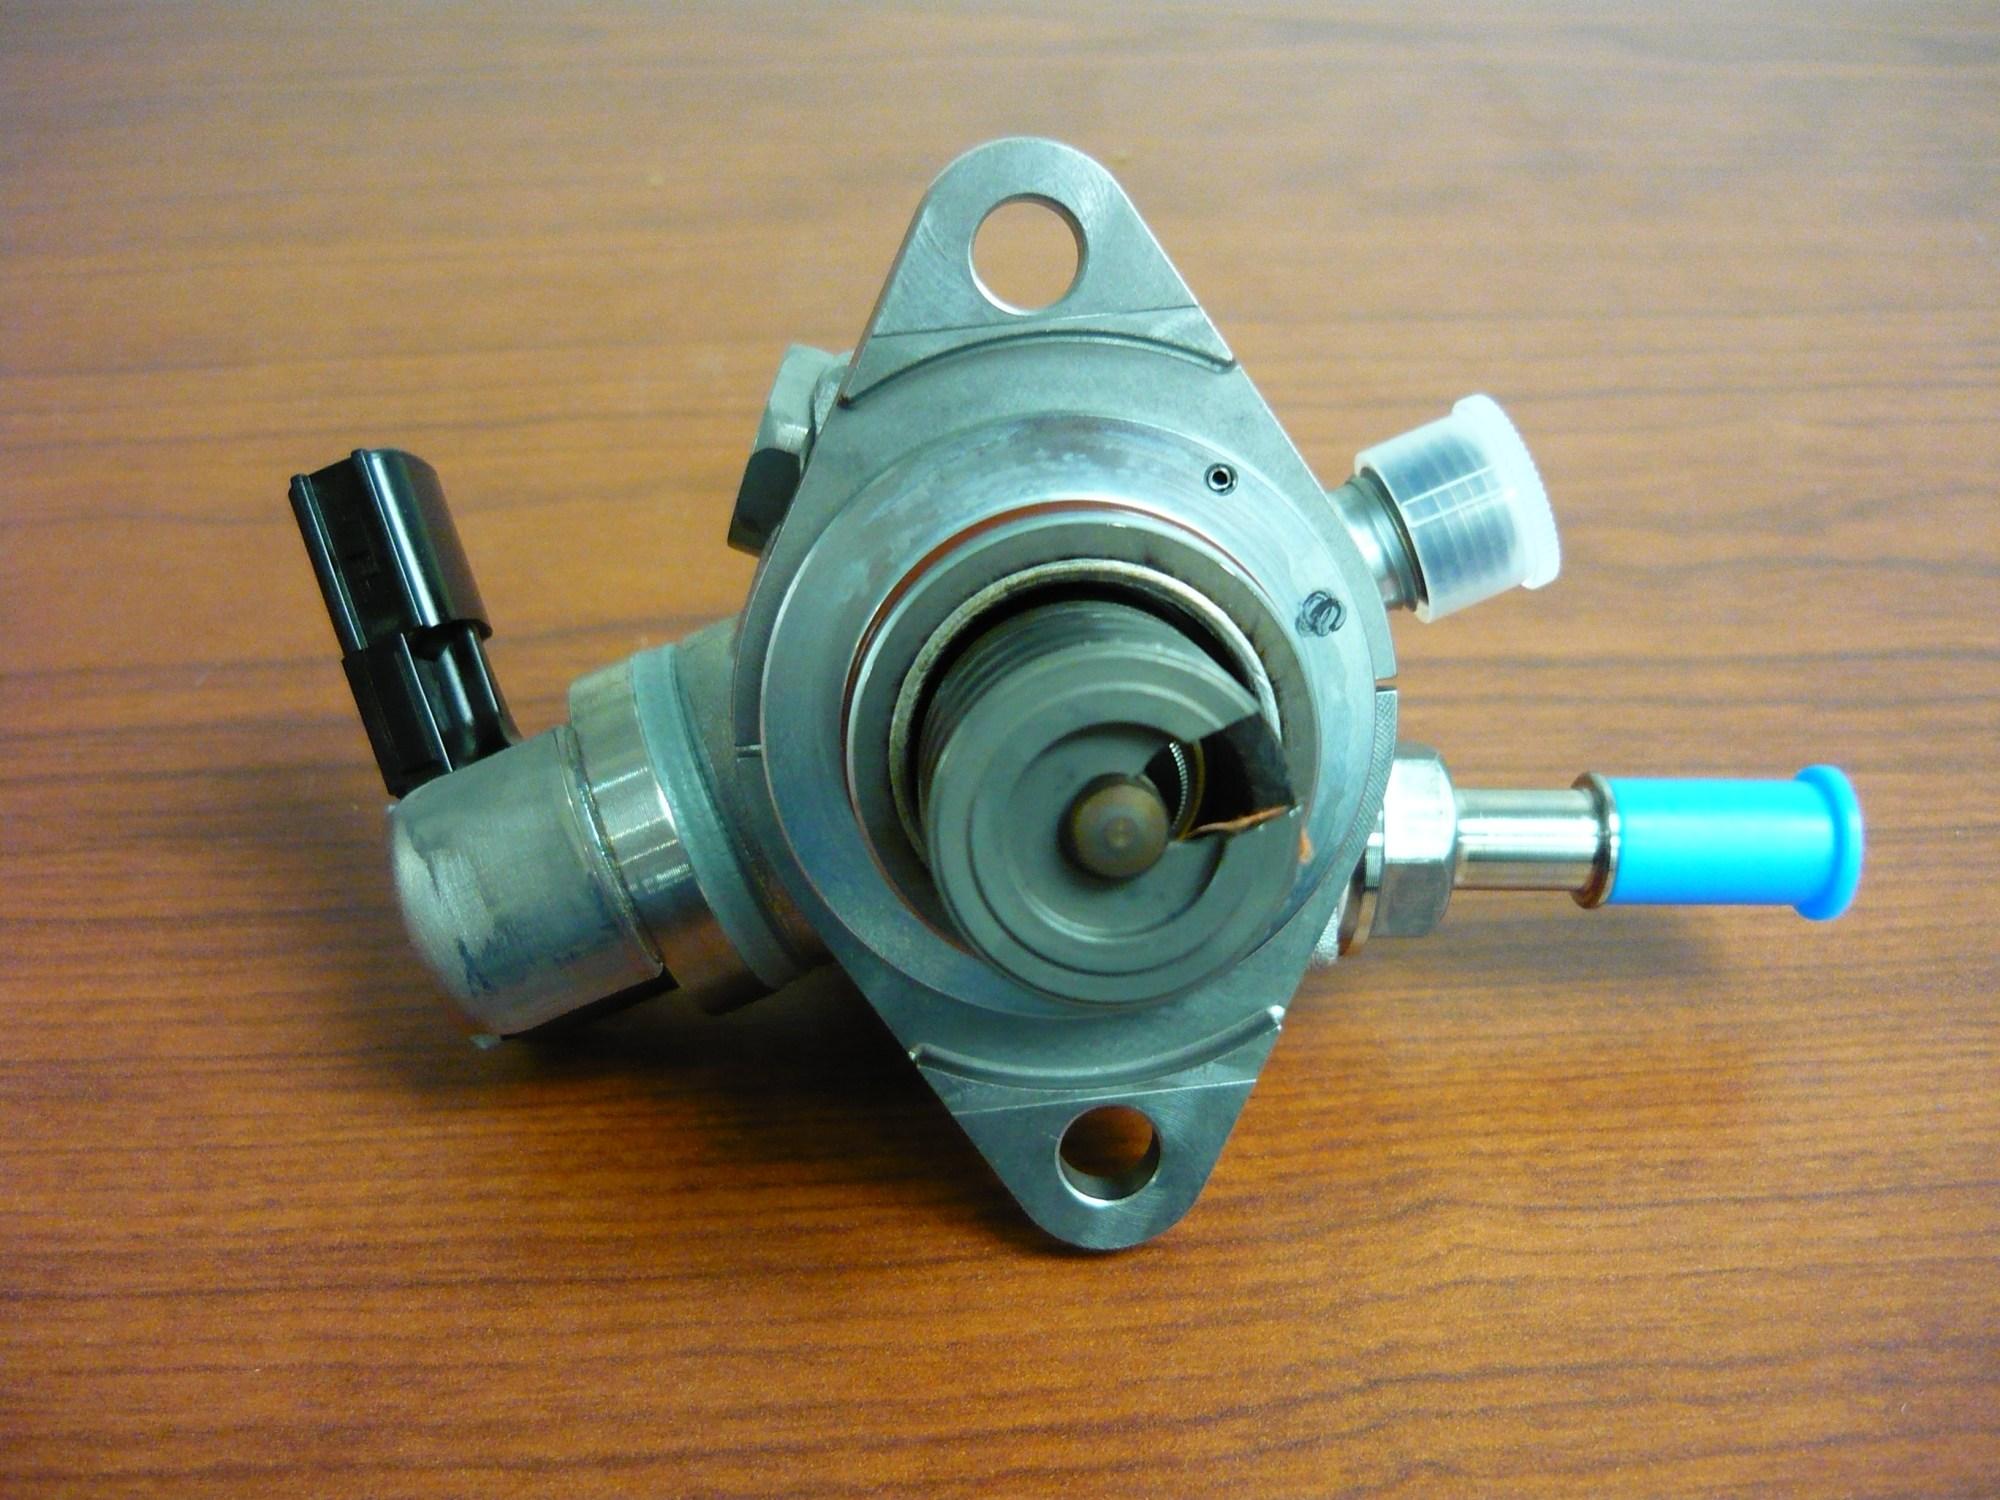 hight resolution of  2000 focus fuel pump removal ford oem 12 16 focus fuel pump cm5z9350cb